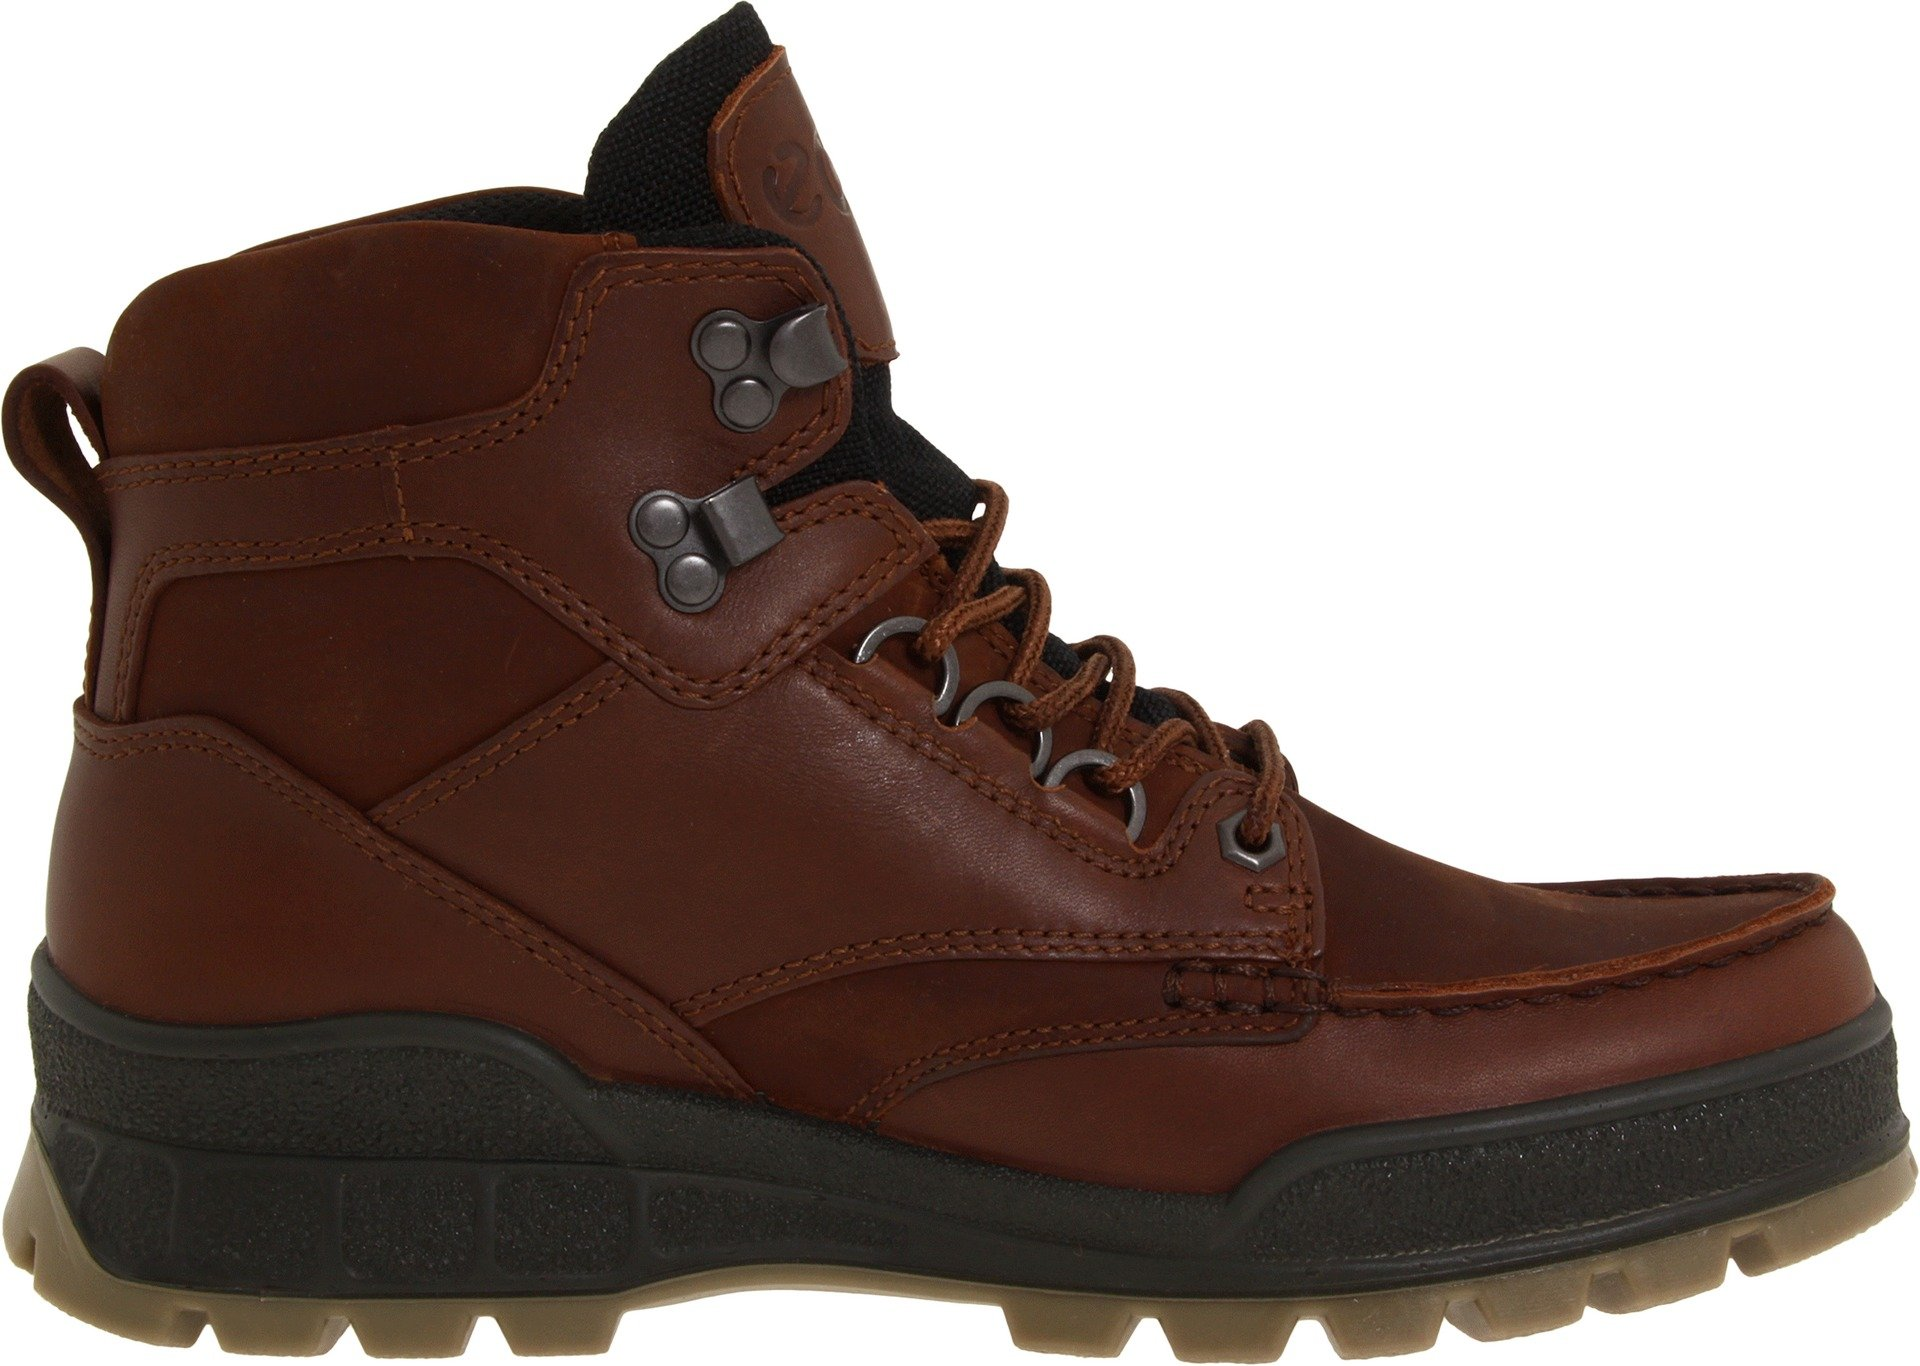 ECCO Men's Track II Mid Gore-Tex Boot,Bison,49 EU (US Men's 15-15.5 M) by ECCO (Image #7)